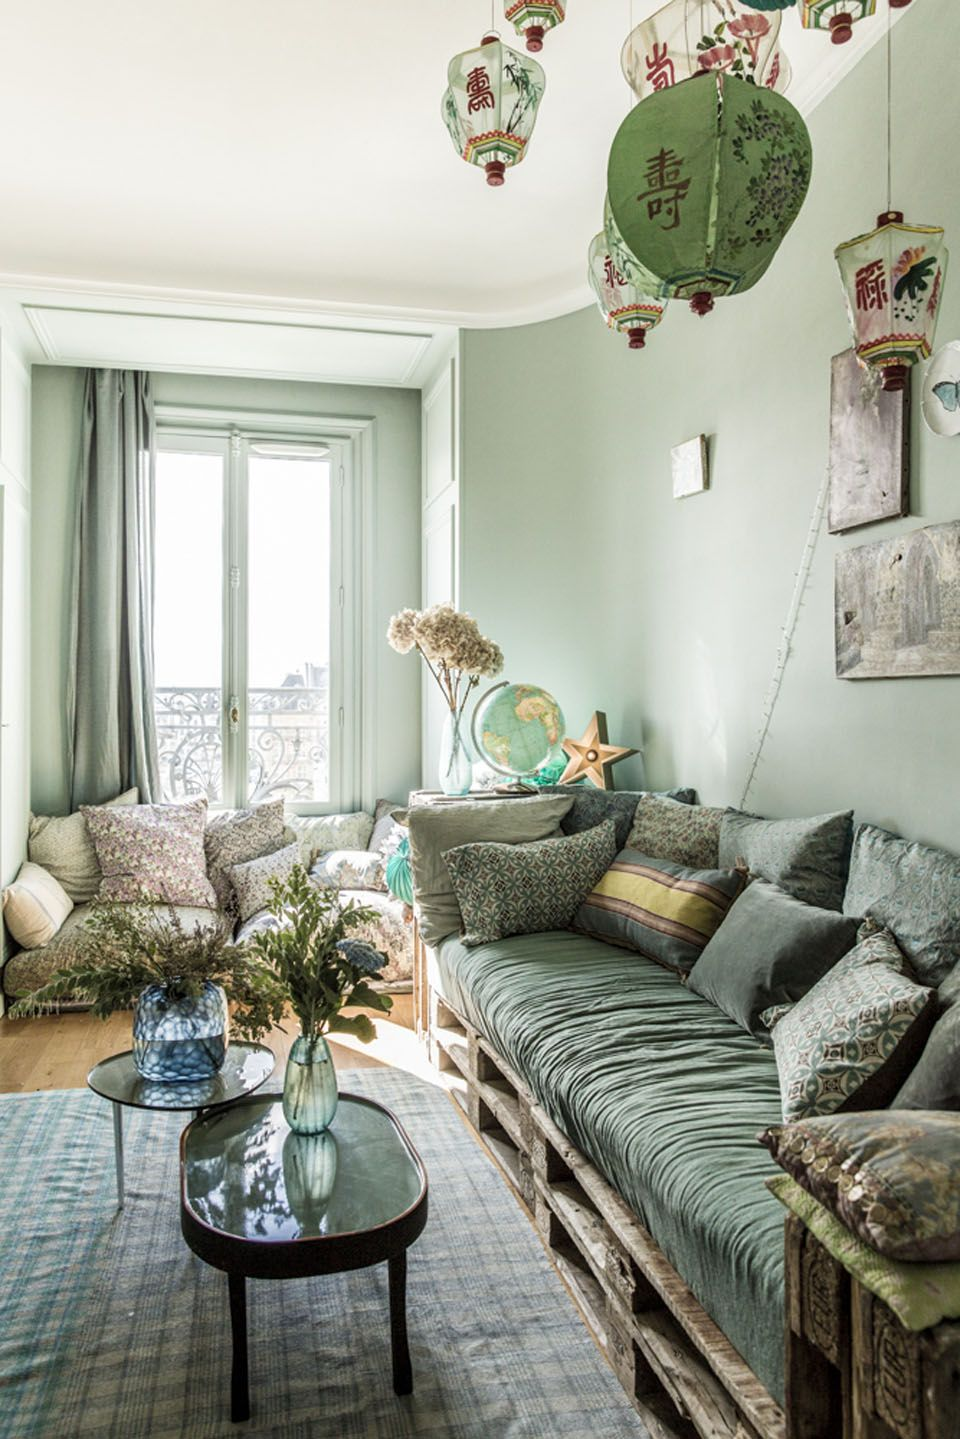 Curiosites Sur Seine House Inspiration